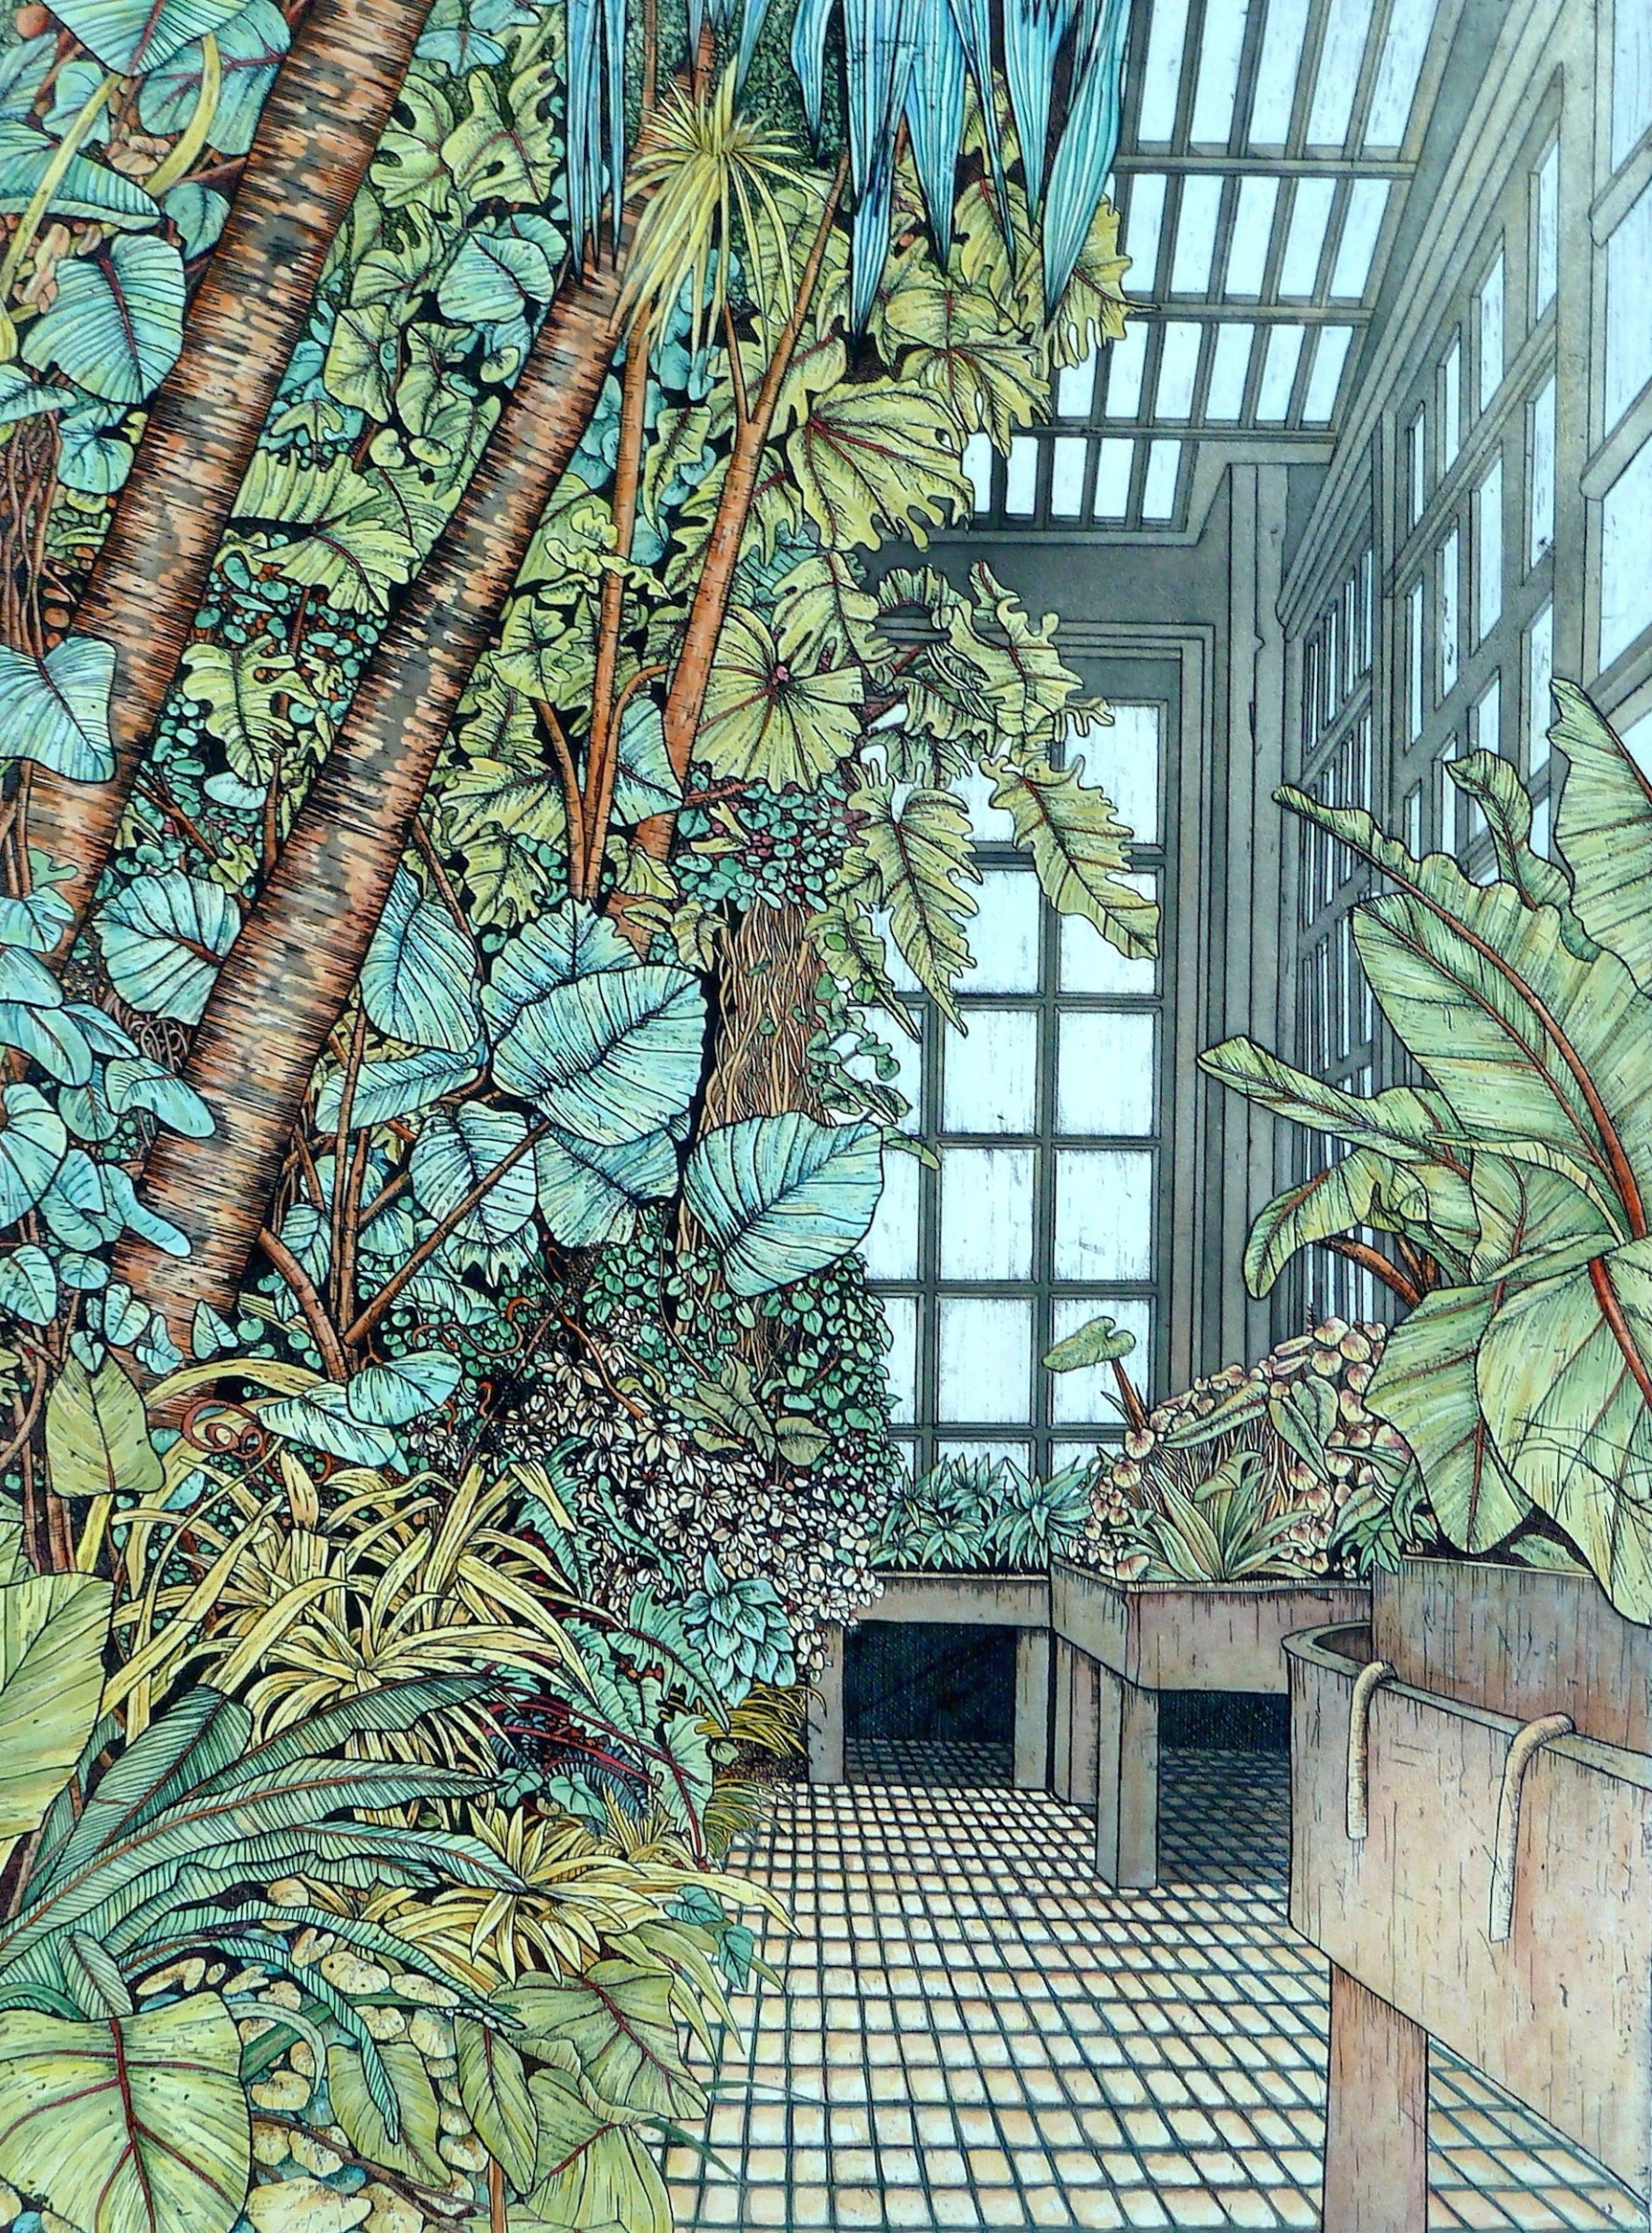 "<span class=""link fancybox-details-link""><a href=""/exhibitions/24/works/artworks_standalone11358/"">View Detail Page</a></span><div class=""artist""><span class=""artist""><strong>Meg Dutton RE</strong></span></div><div class=""title""><em>Tropical House</em></div><div class=""medium"">etching and watercolour</div><div class=""dimensions"">89 x 72 cm framed<br>67 x 49 cm image size</div><div class=""edition_details"">edition of 40</div>"